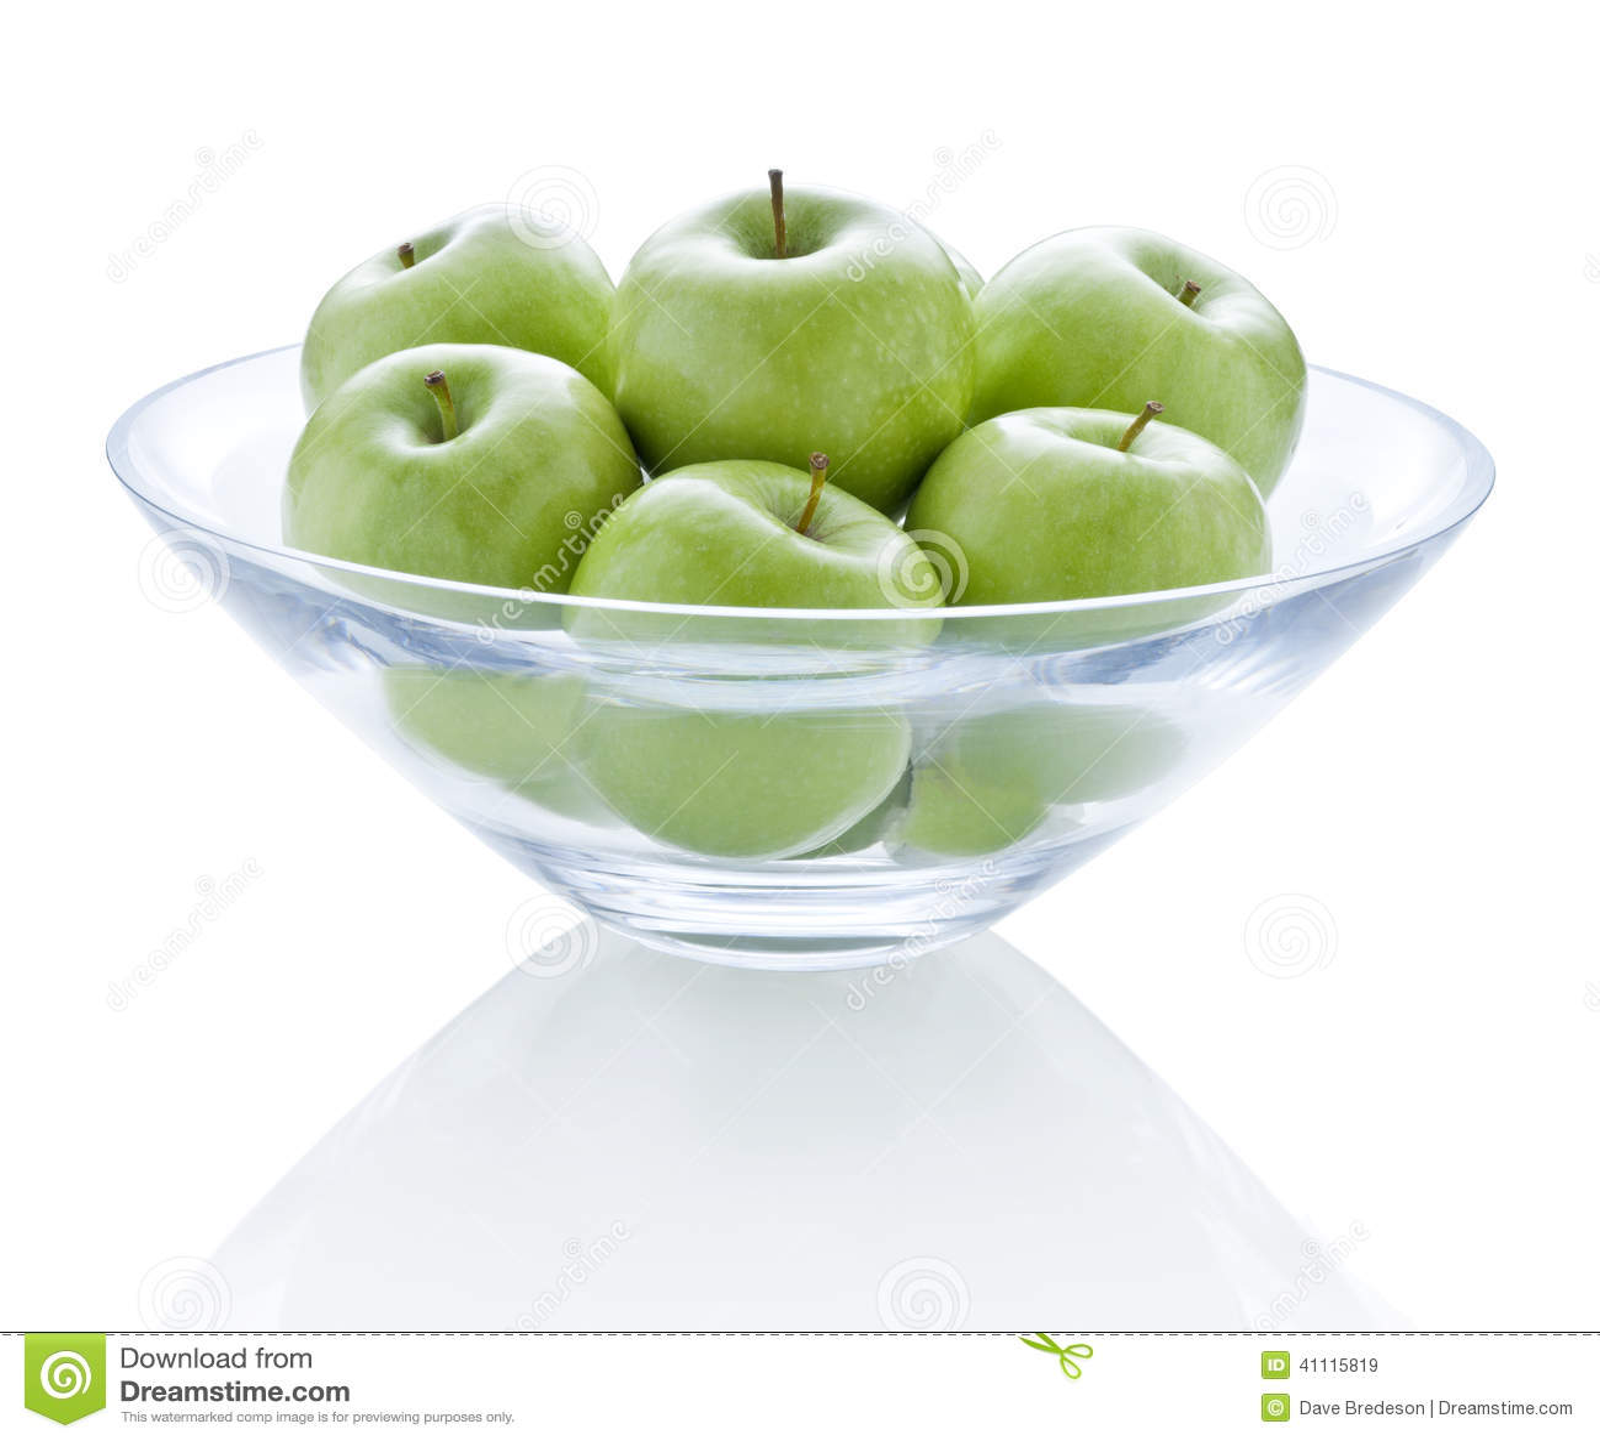 Bowl Green Apples Stock Photo - Image: 41115819